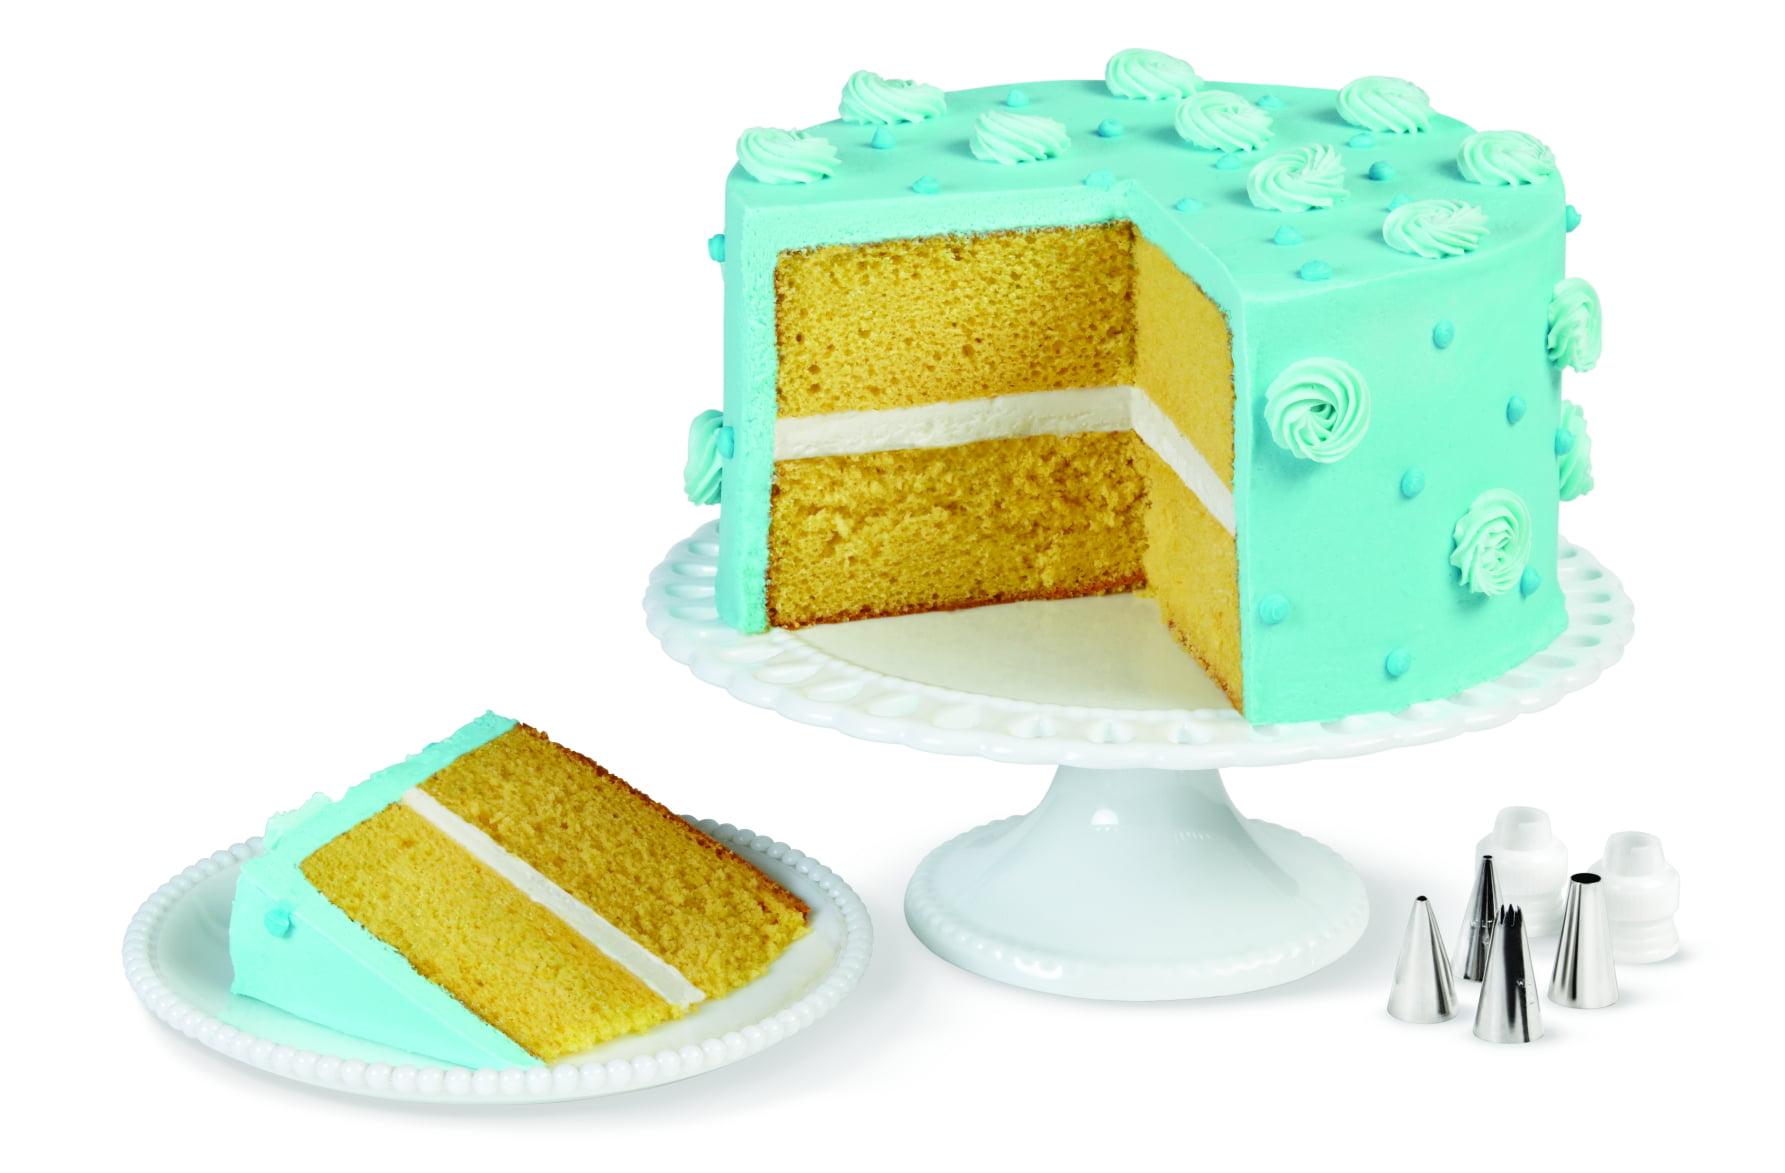 Wilton Cake & Dessert Decorating Set, 18-Piece - Walmart.com